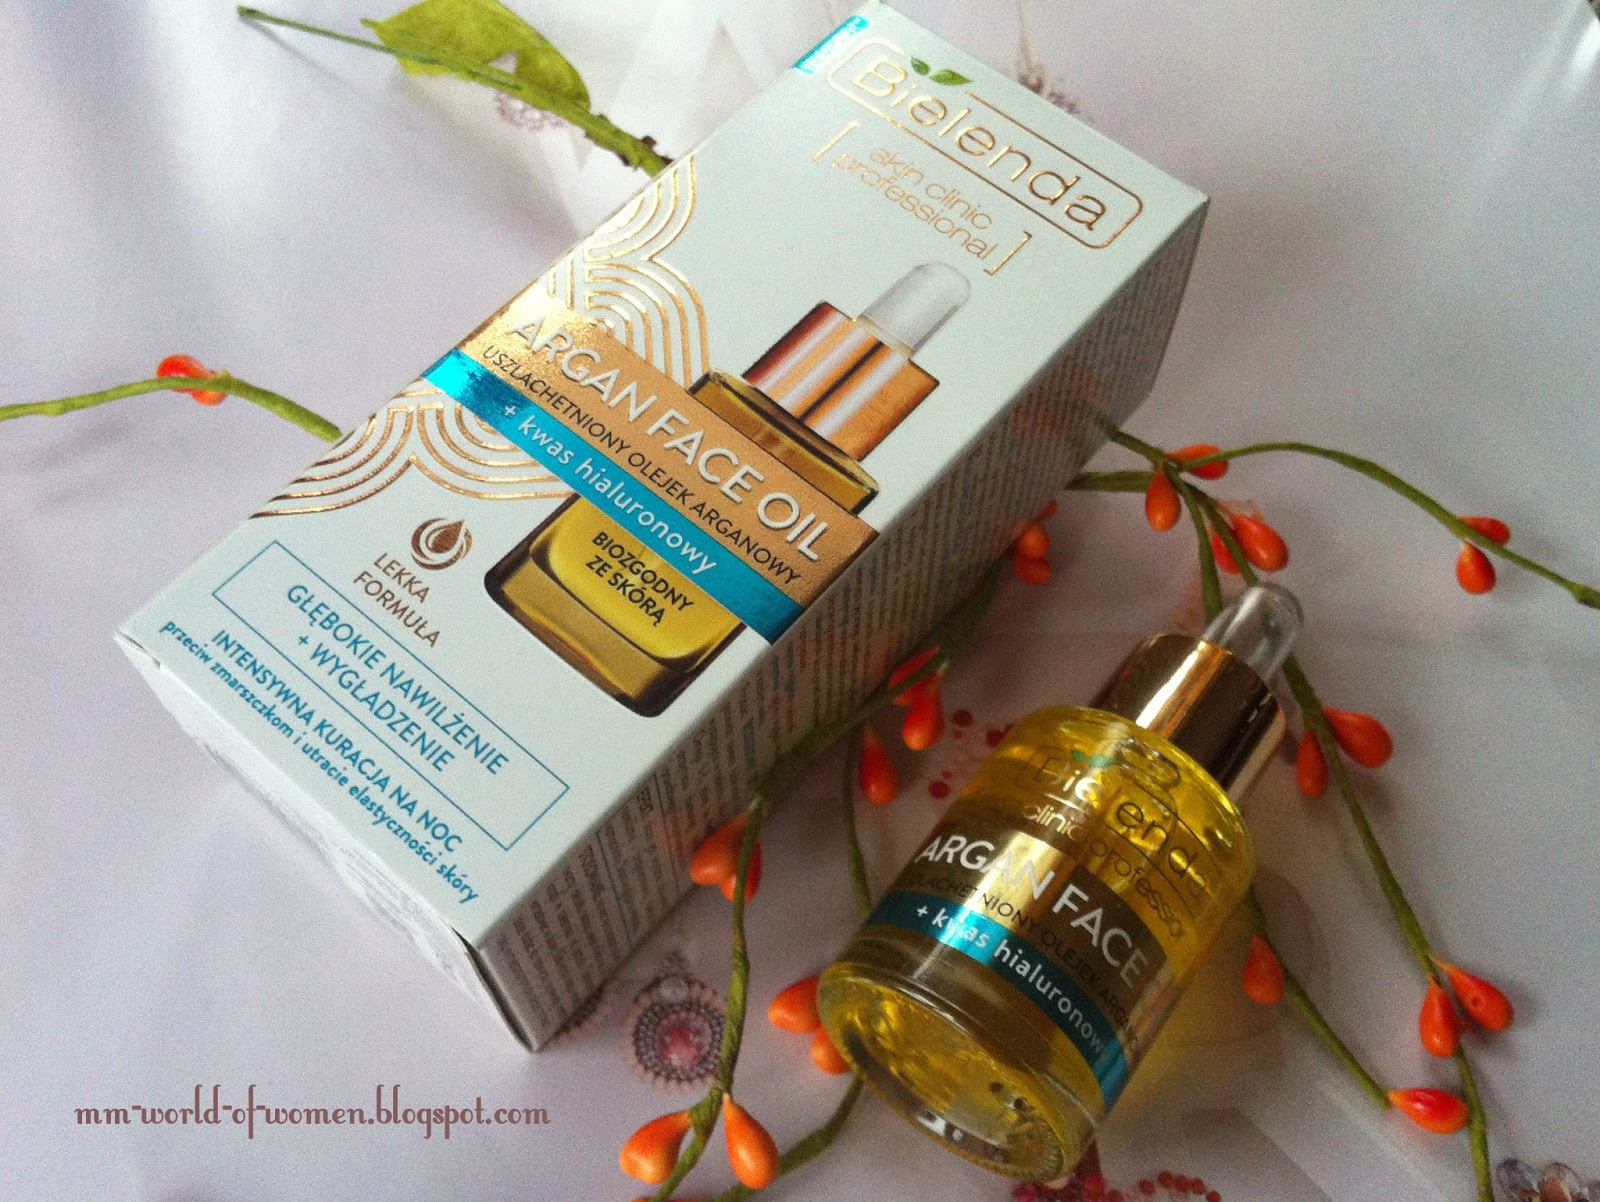 Bielenda Skin Clinic professional Argan Face Oil Uszlachetniony olejek arganowy + kwas hialuronowy